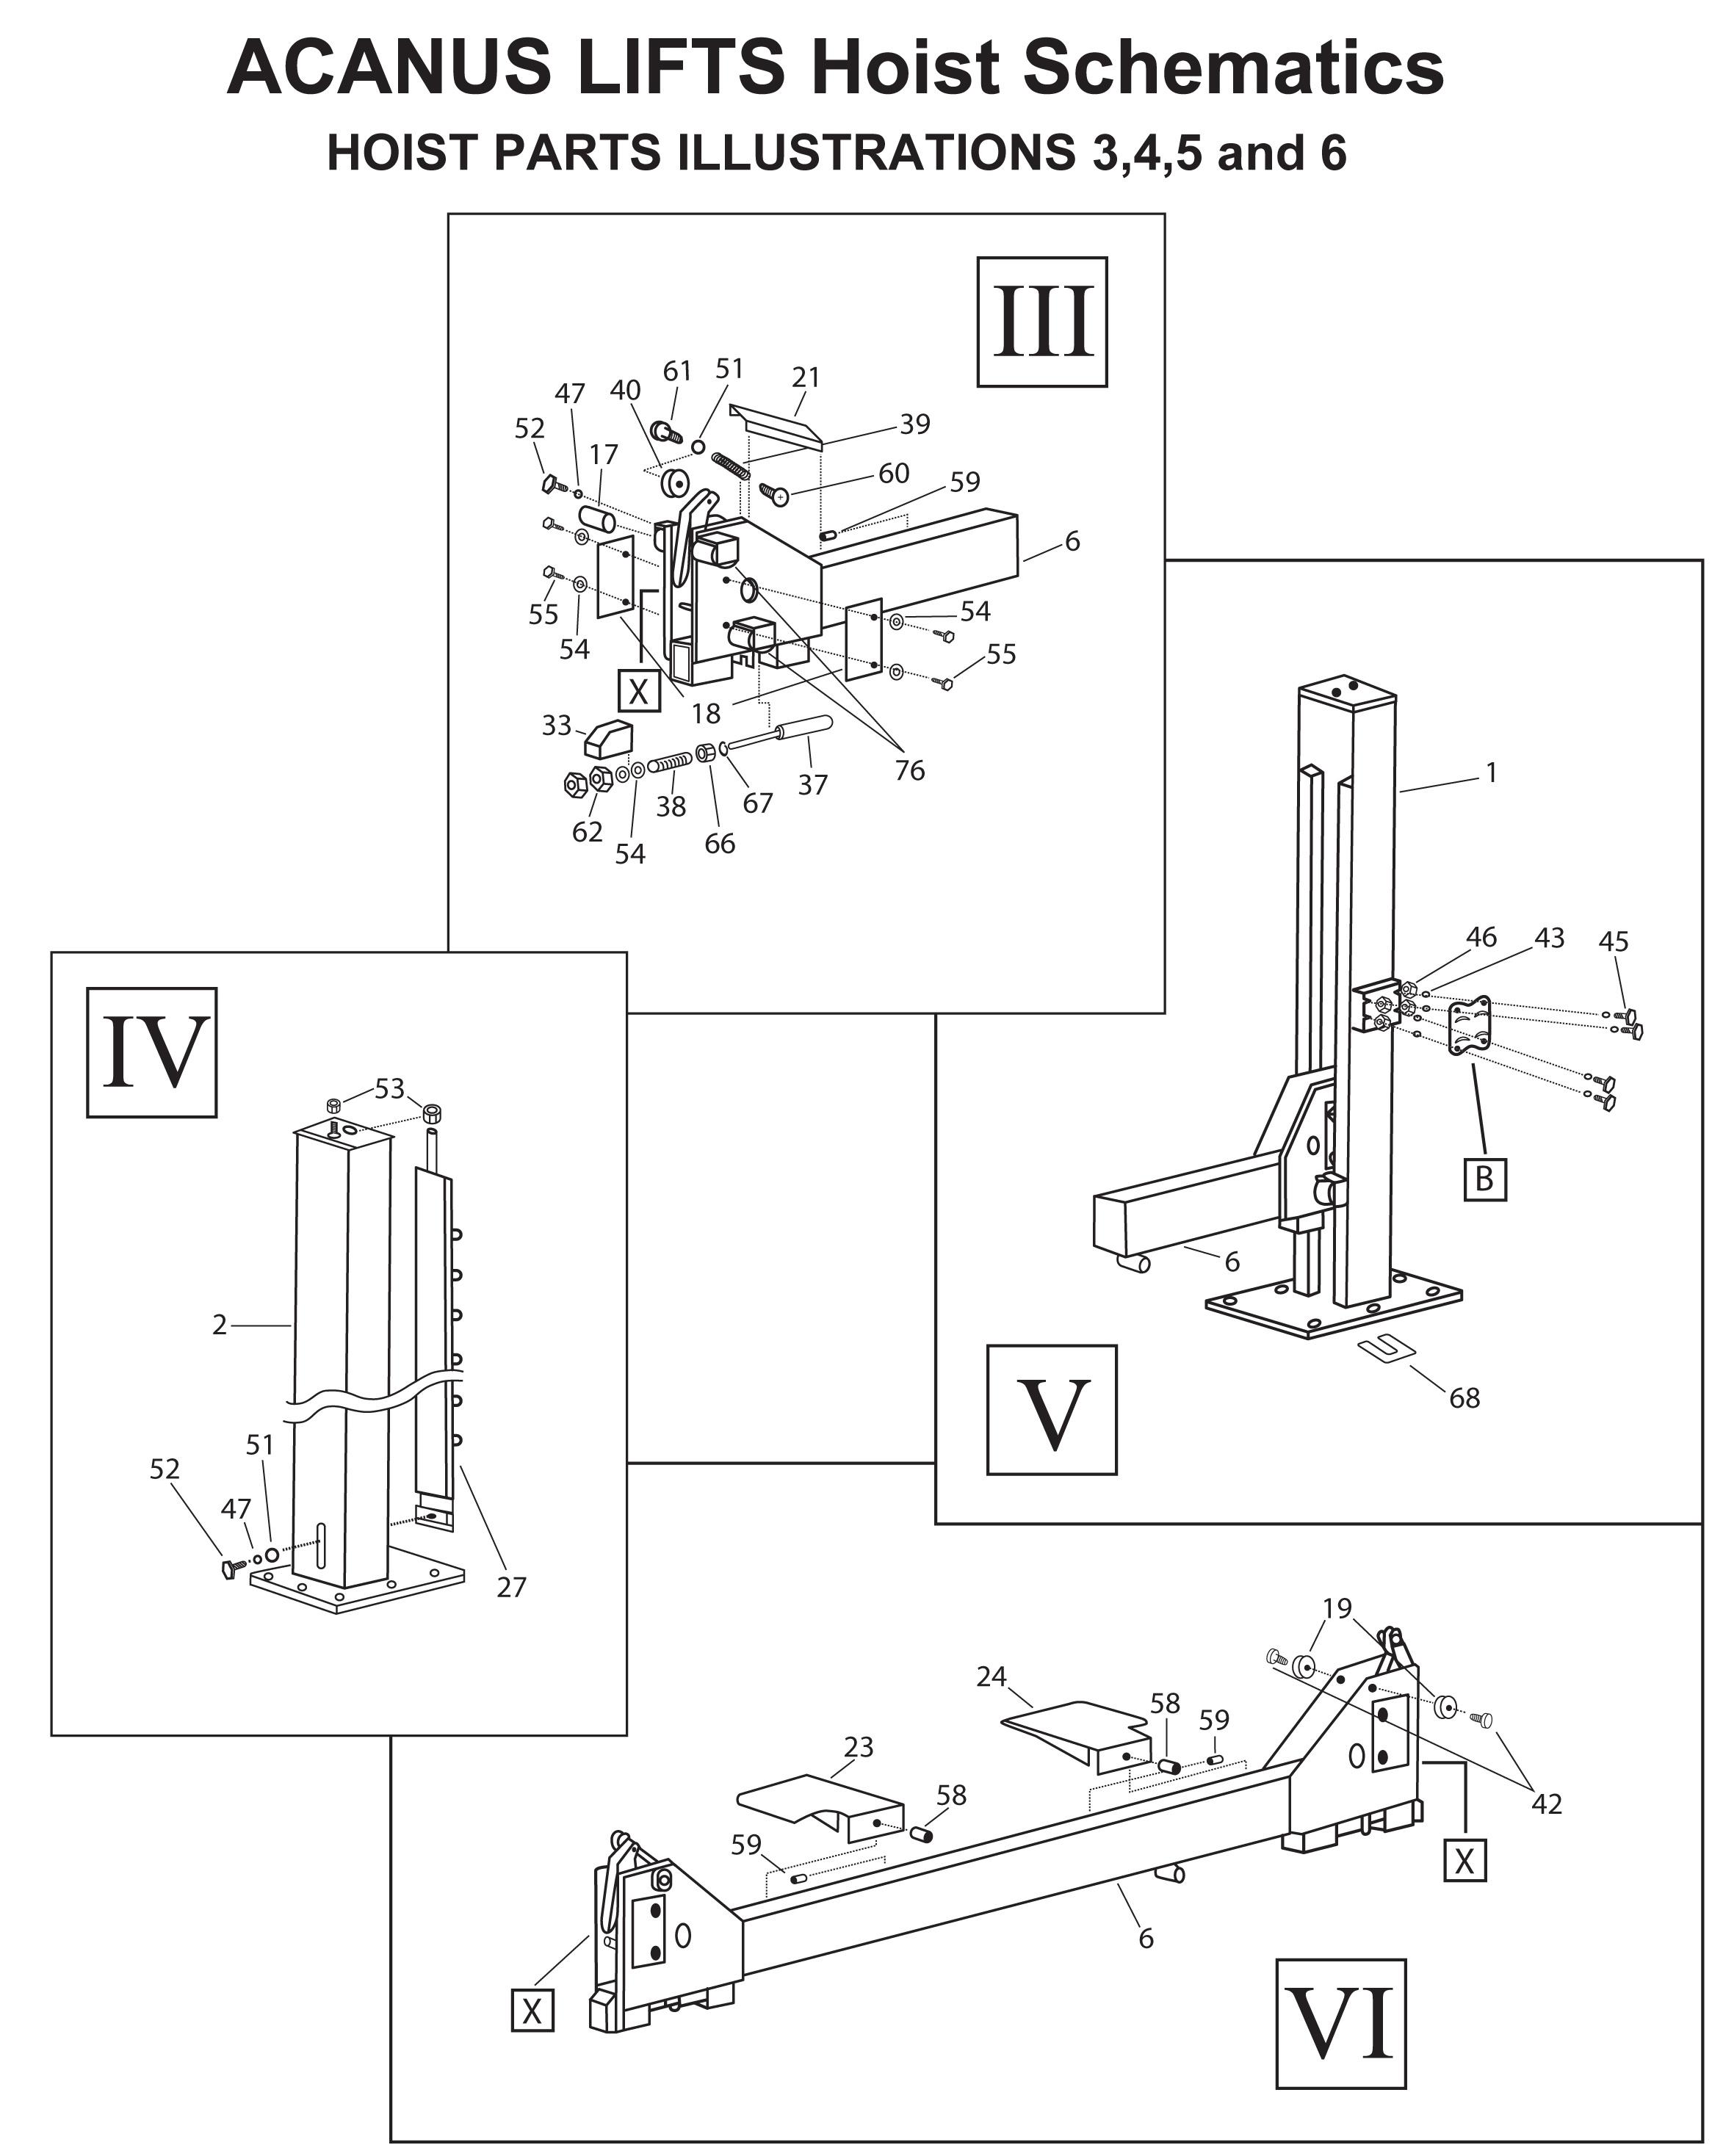 Acanus Lift Parts, Acanus Auto Lift Parts, Acanus Power